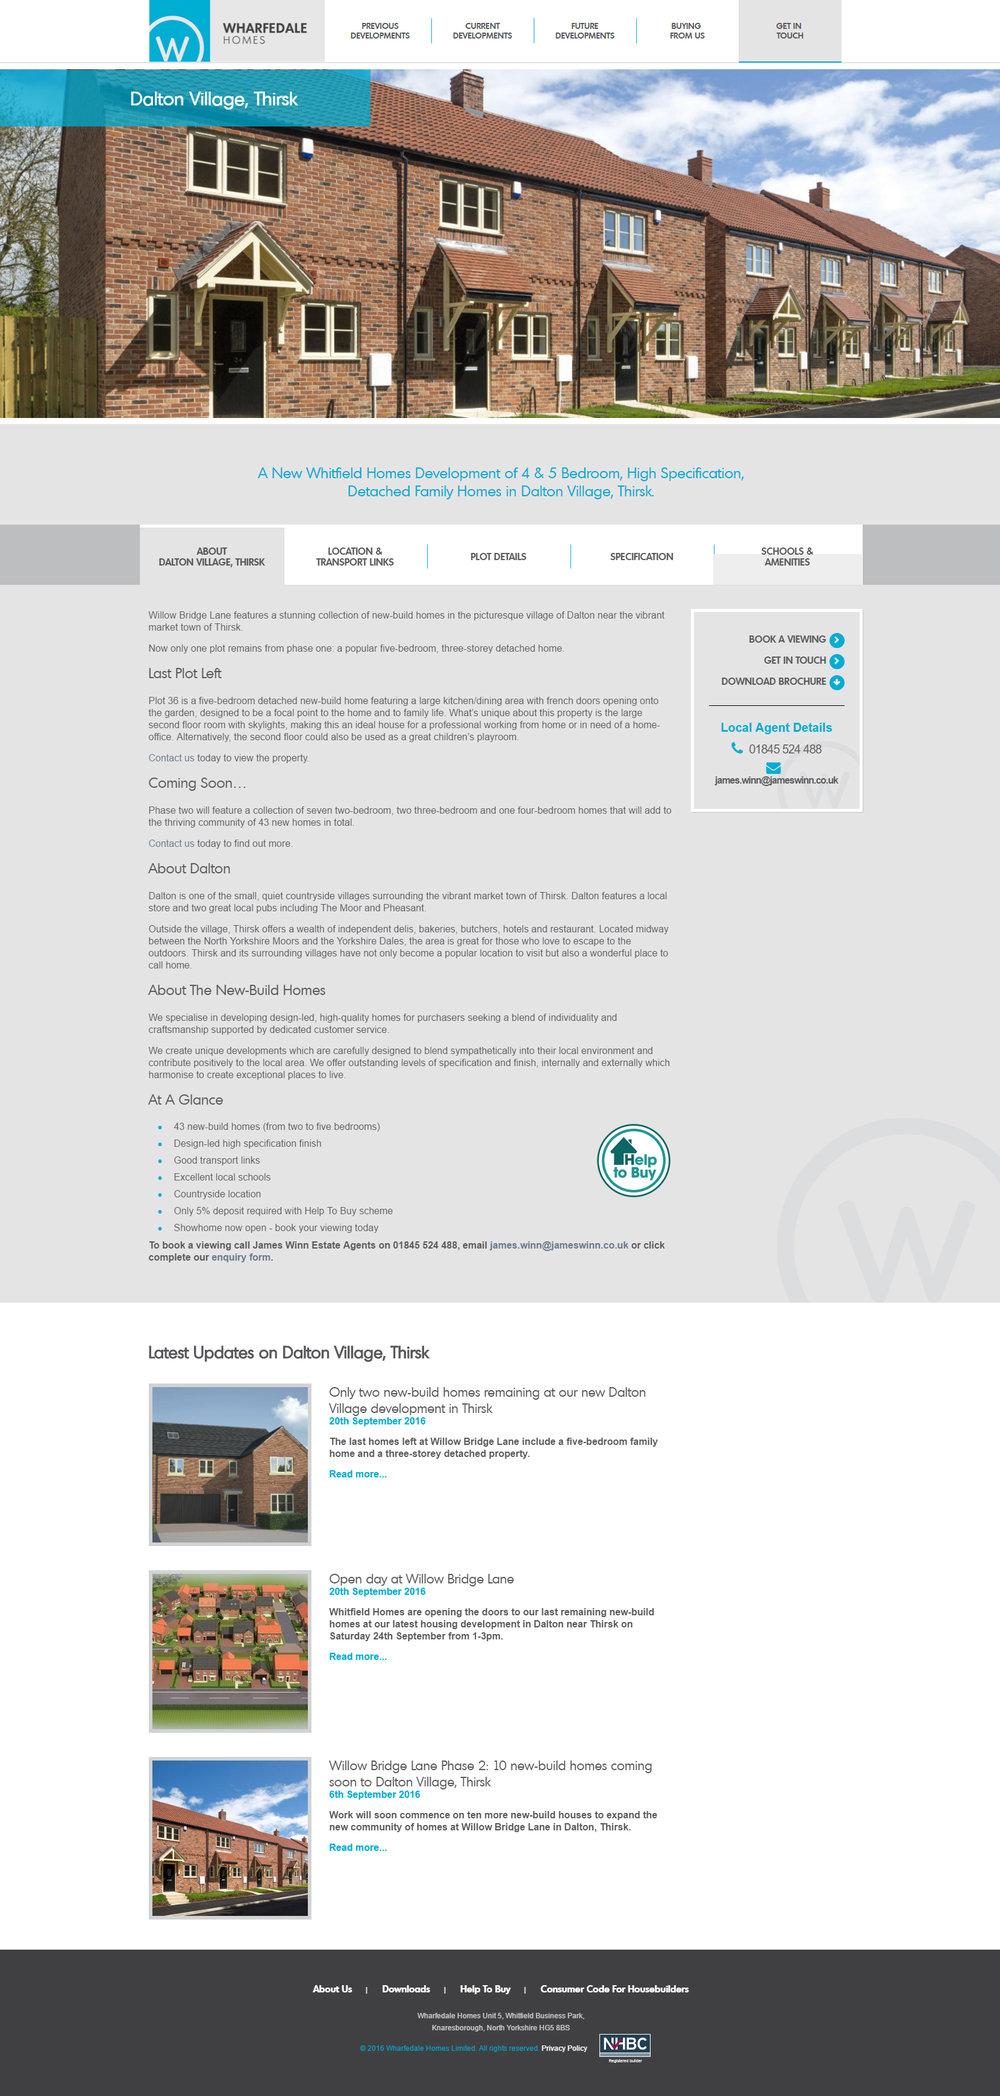 Wharfedale Homes - site designs